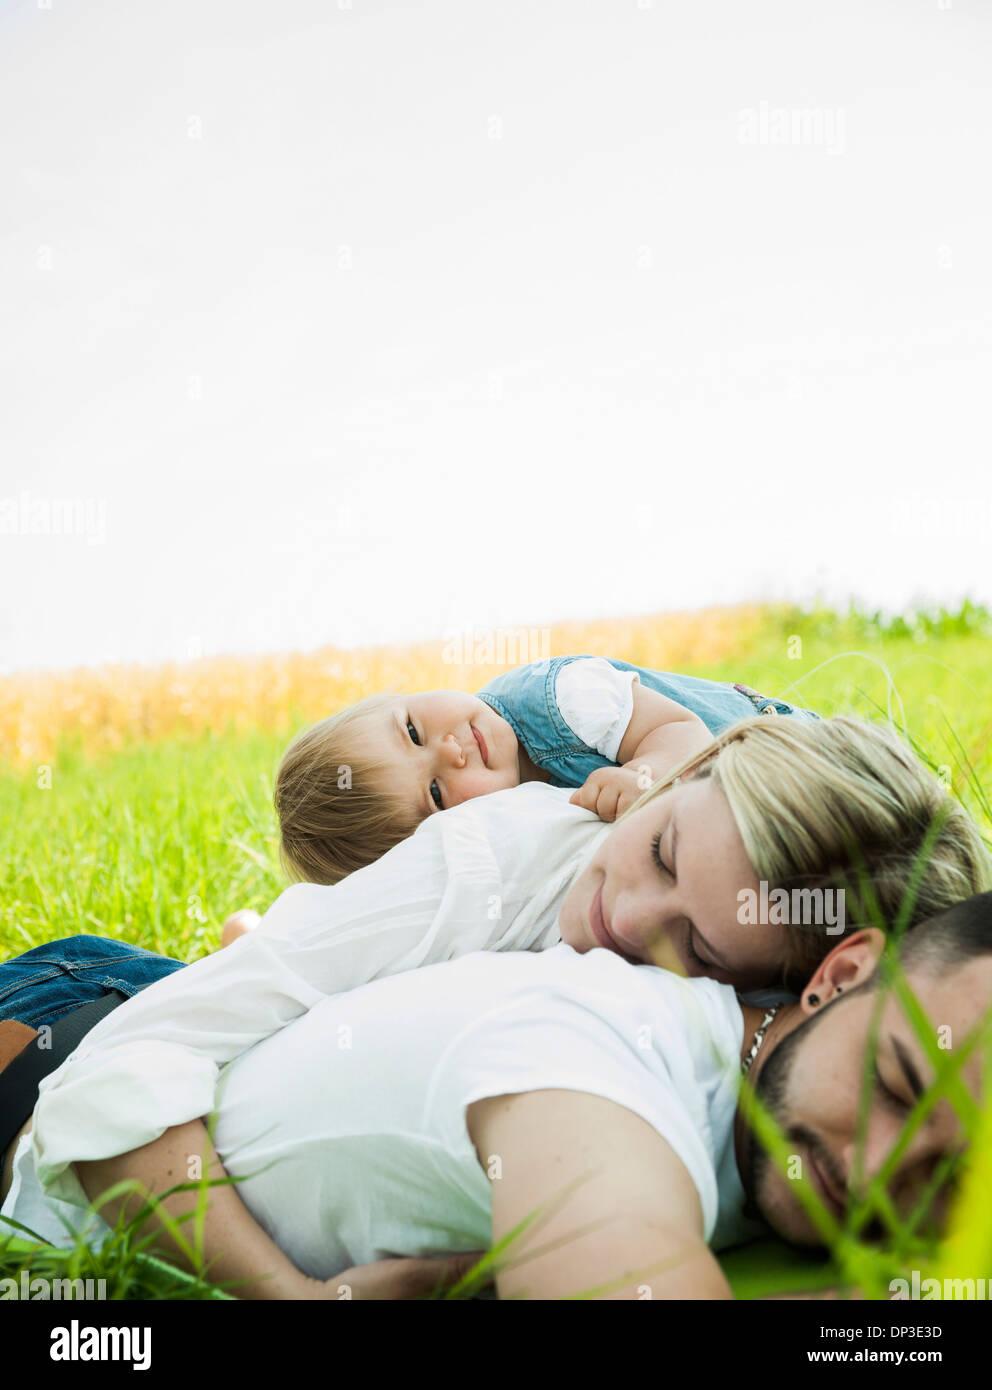 Family Sleeping in Grass, Mannheim, Baden-Wurttemberg, Germany Stock Photo